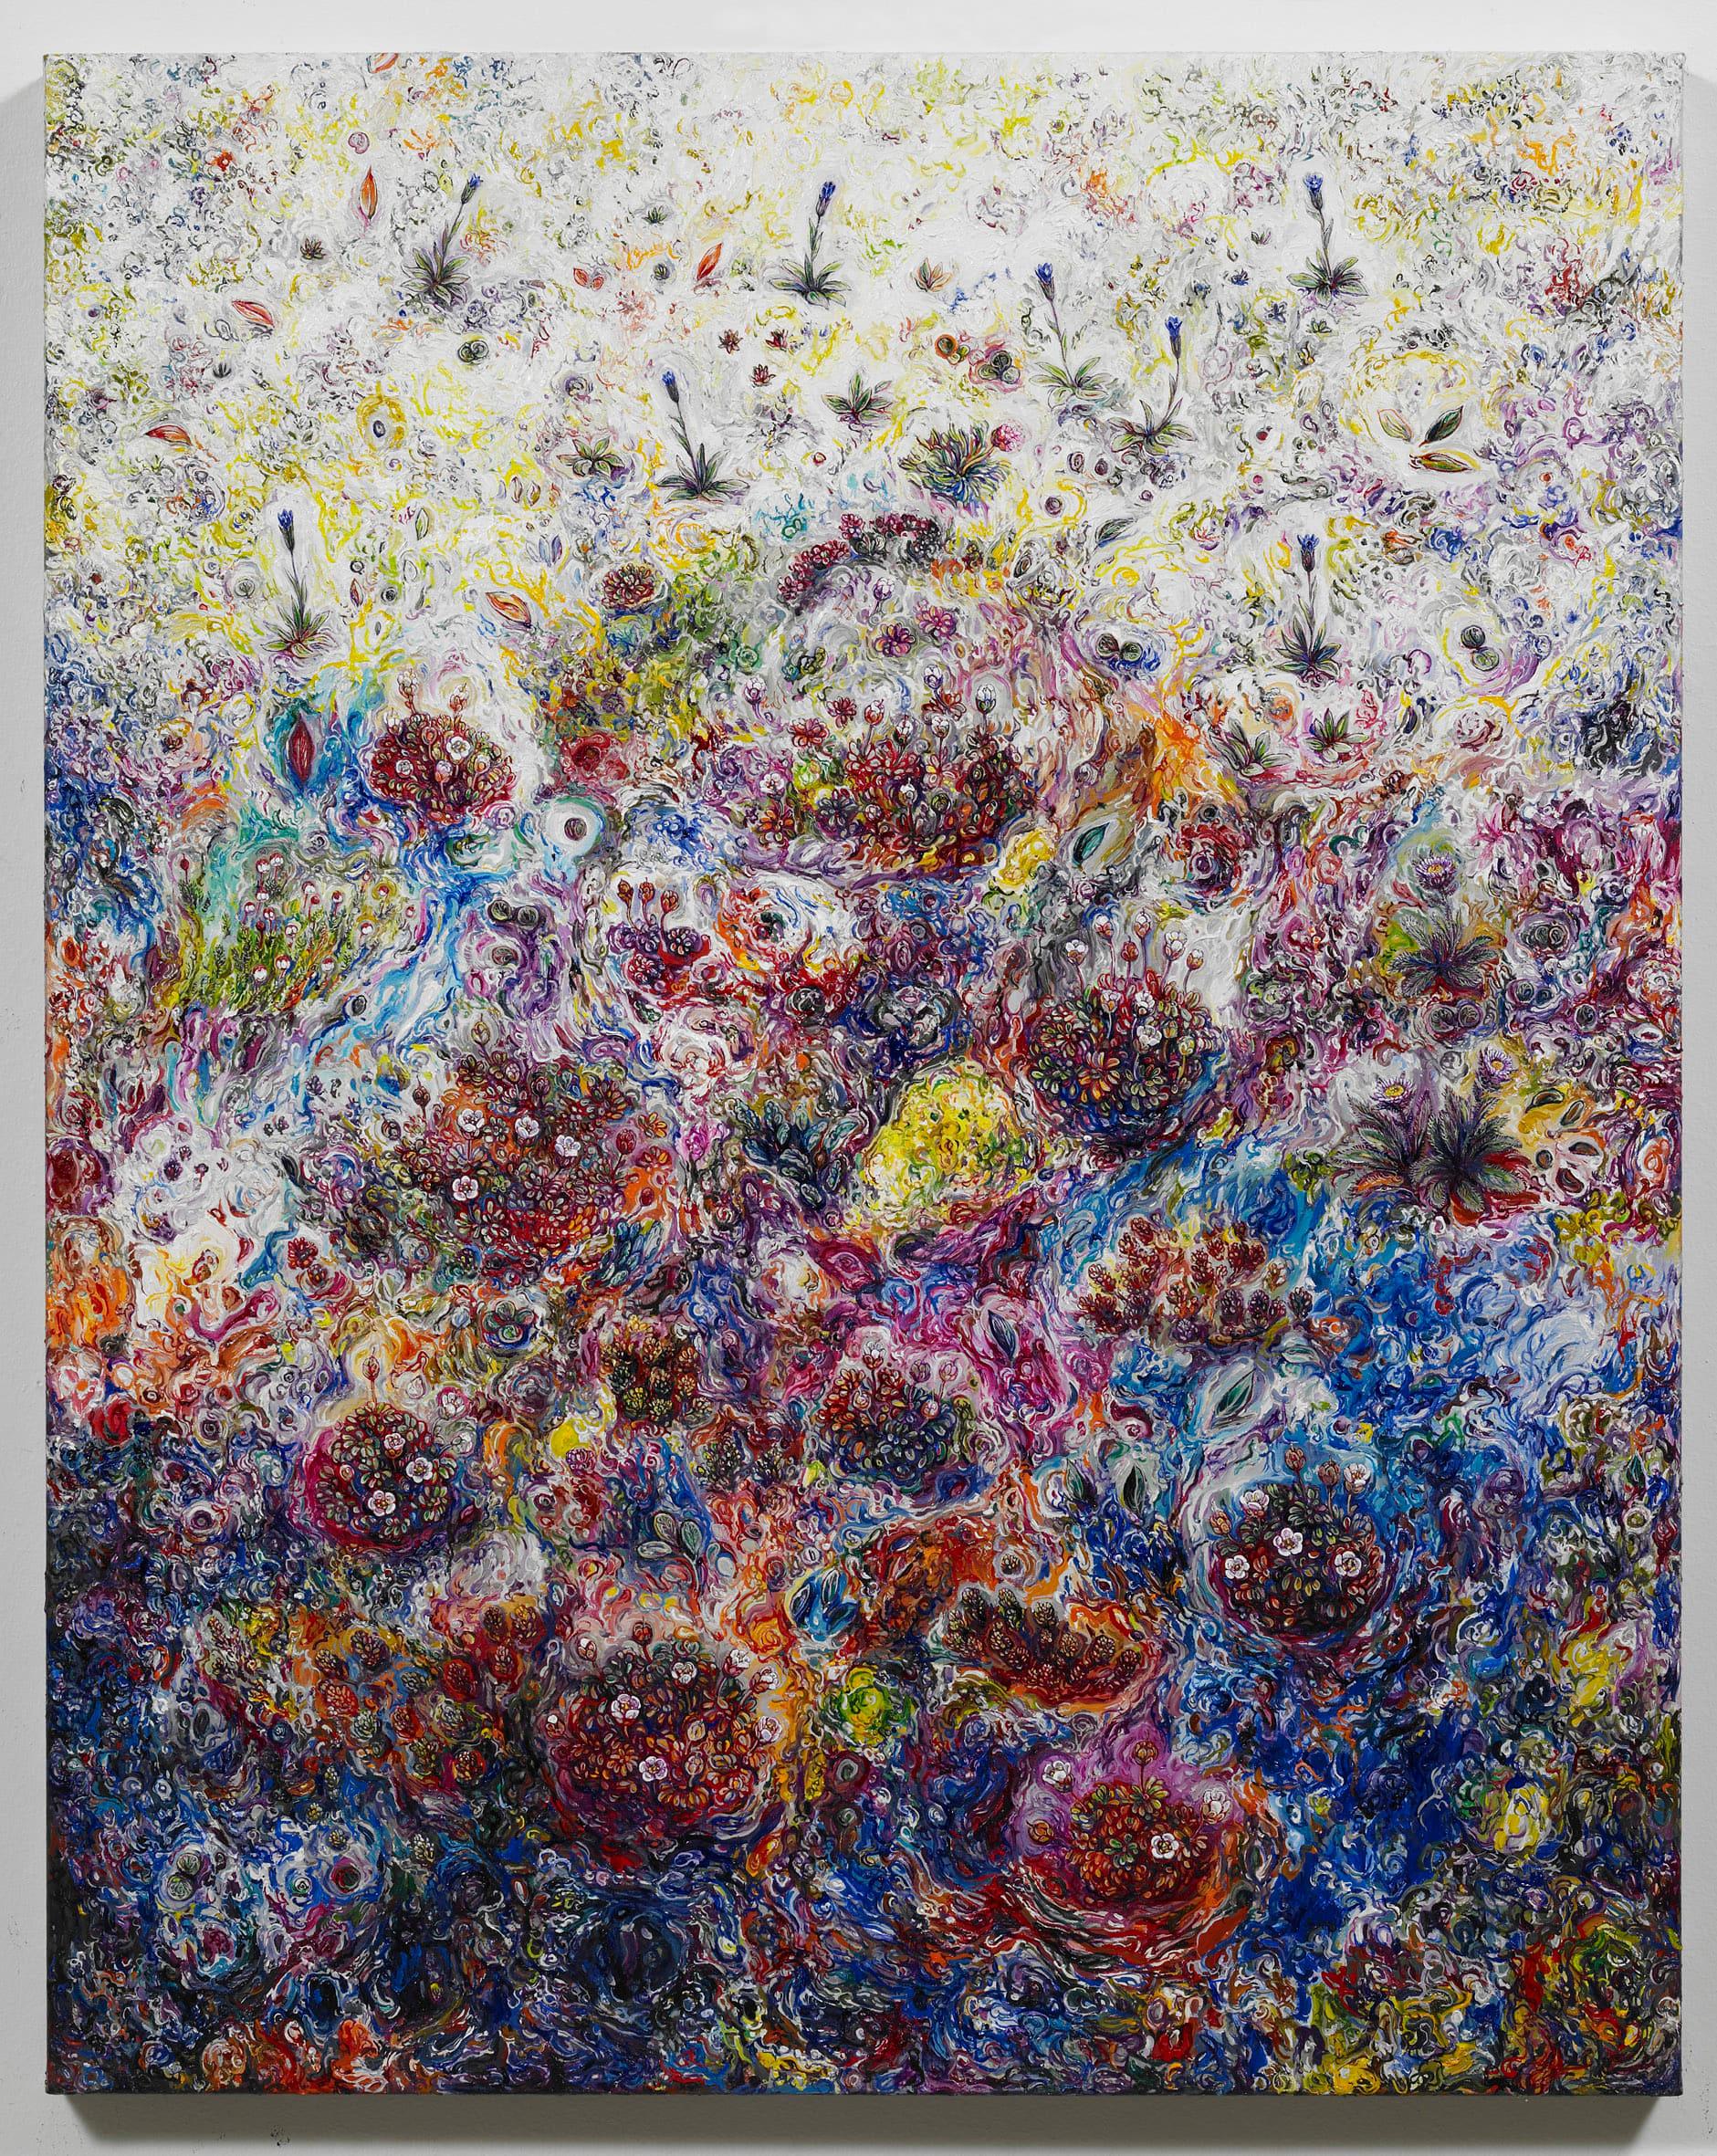 "<span class=""link fancybox-details-link""><a href=""/exhibitions/128/works/artworks8848/"">View Detail Page</a></span><div class=""artist""><strong>EGGERT PÉTURSSON</strong></div><div class=""title""><em>Untitled / Án titils (Fjallabláklukkur og Fjallabrúða)</em>, 2011-2012</div><div class=""signed_and_dated"">signed on back</div><div class=""medium"">oil on canvas / olía á striga</div><div class=""dimensions"">100.0 x 80.0 cm<br>39 1/8 x 31 3/16 in</div>"